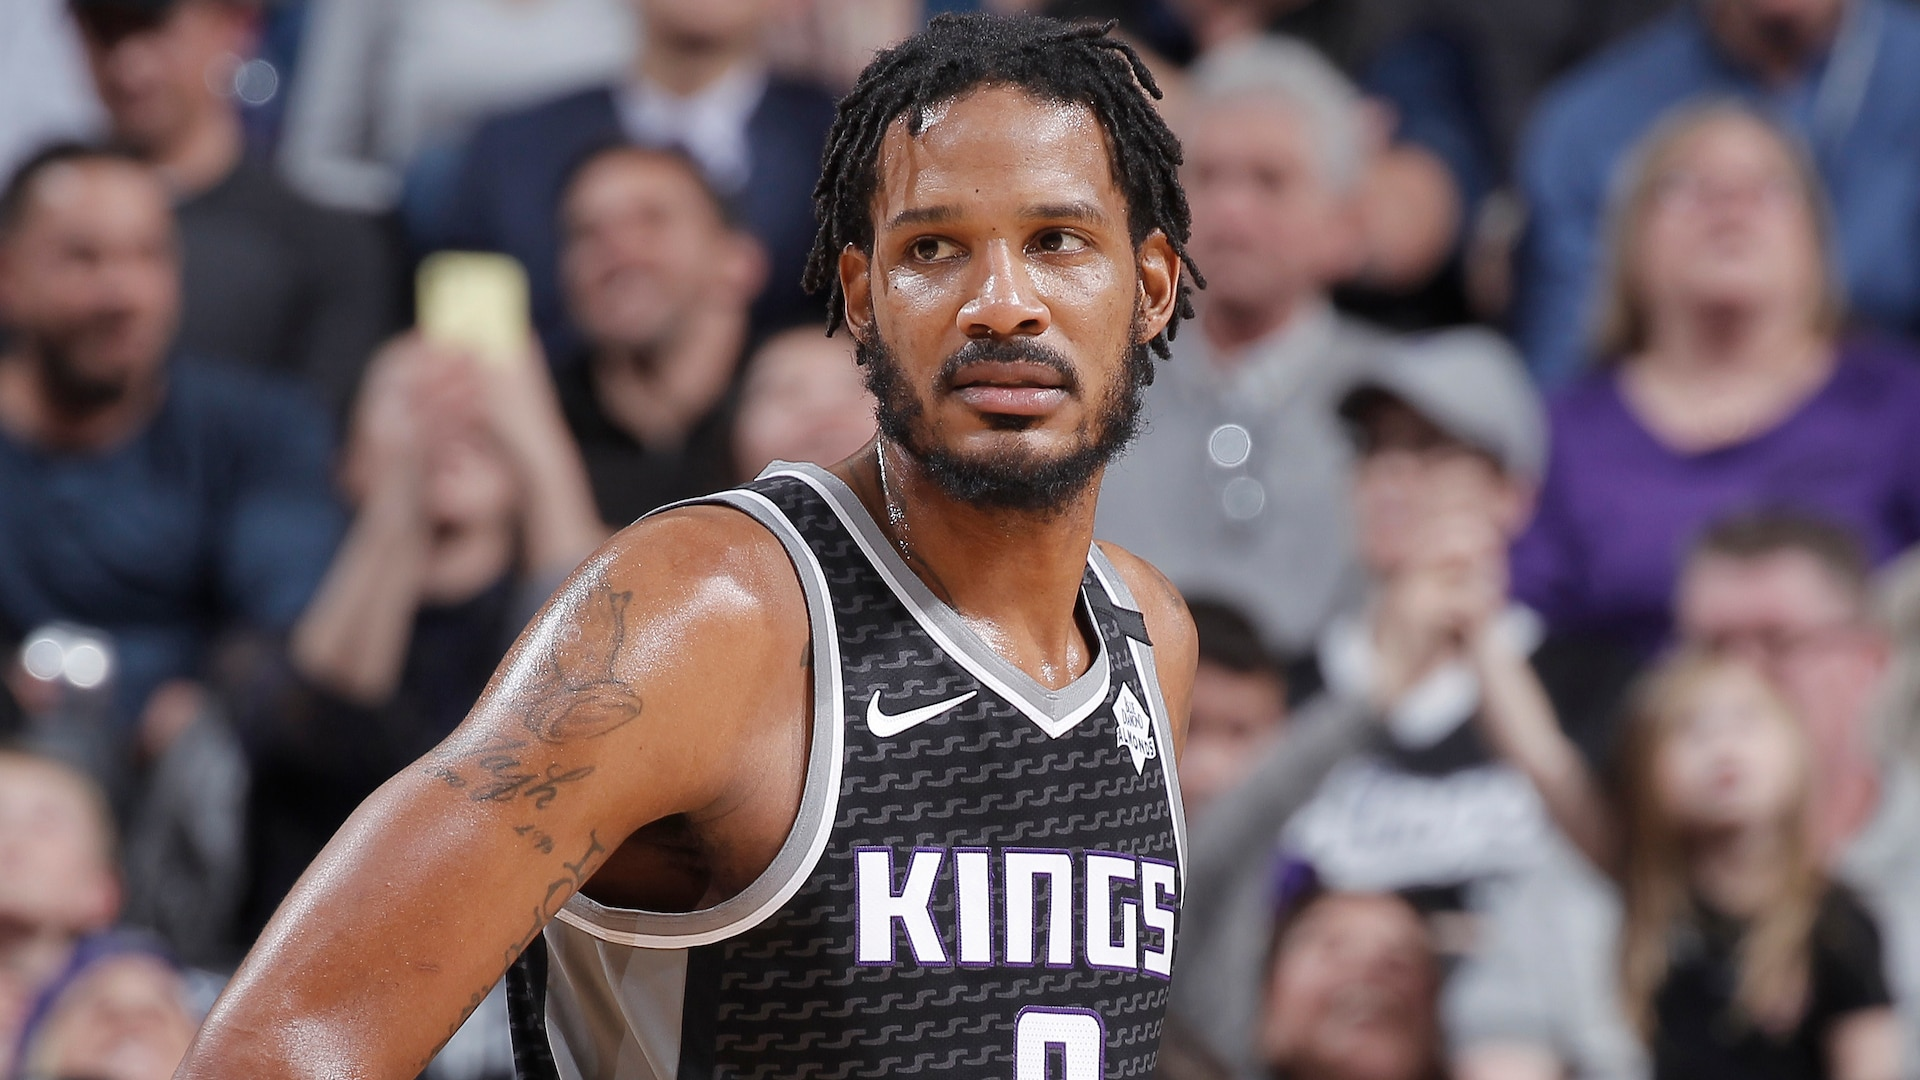 Blazers pick up veteran Ariza in swap with Kings